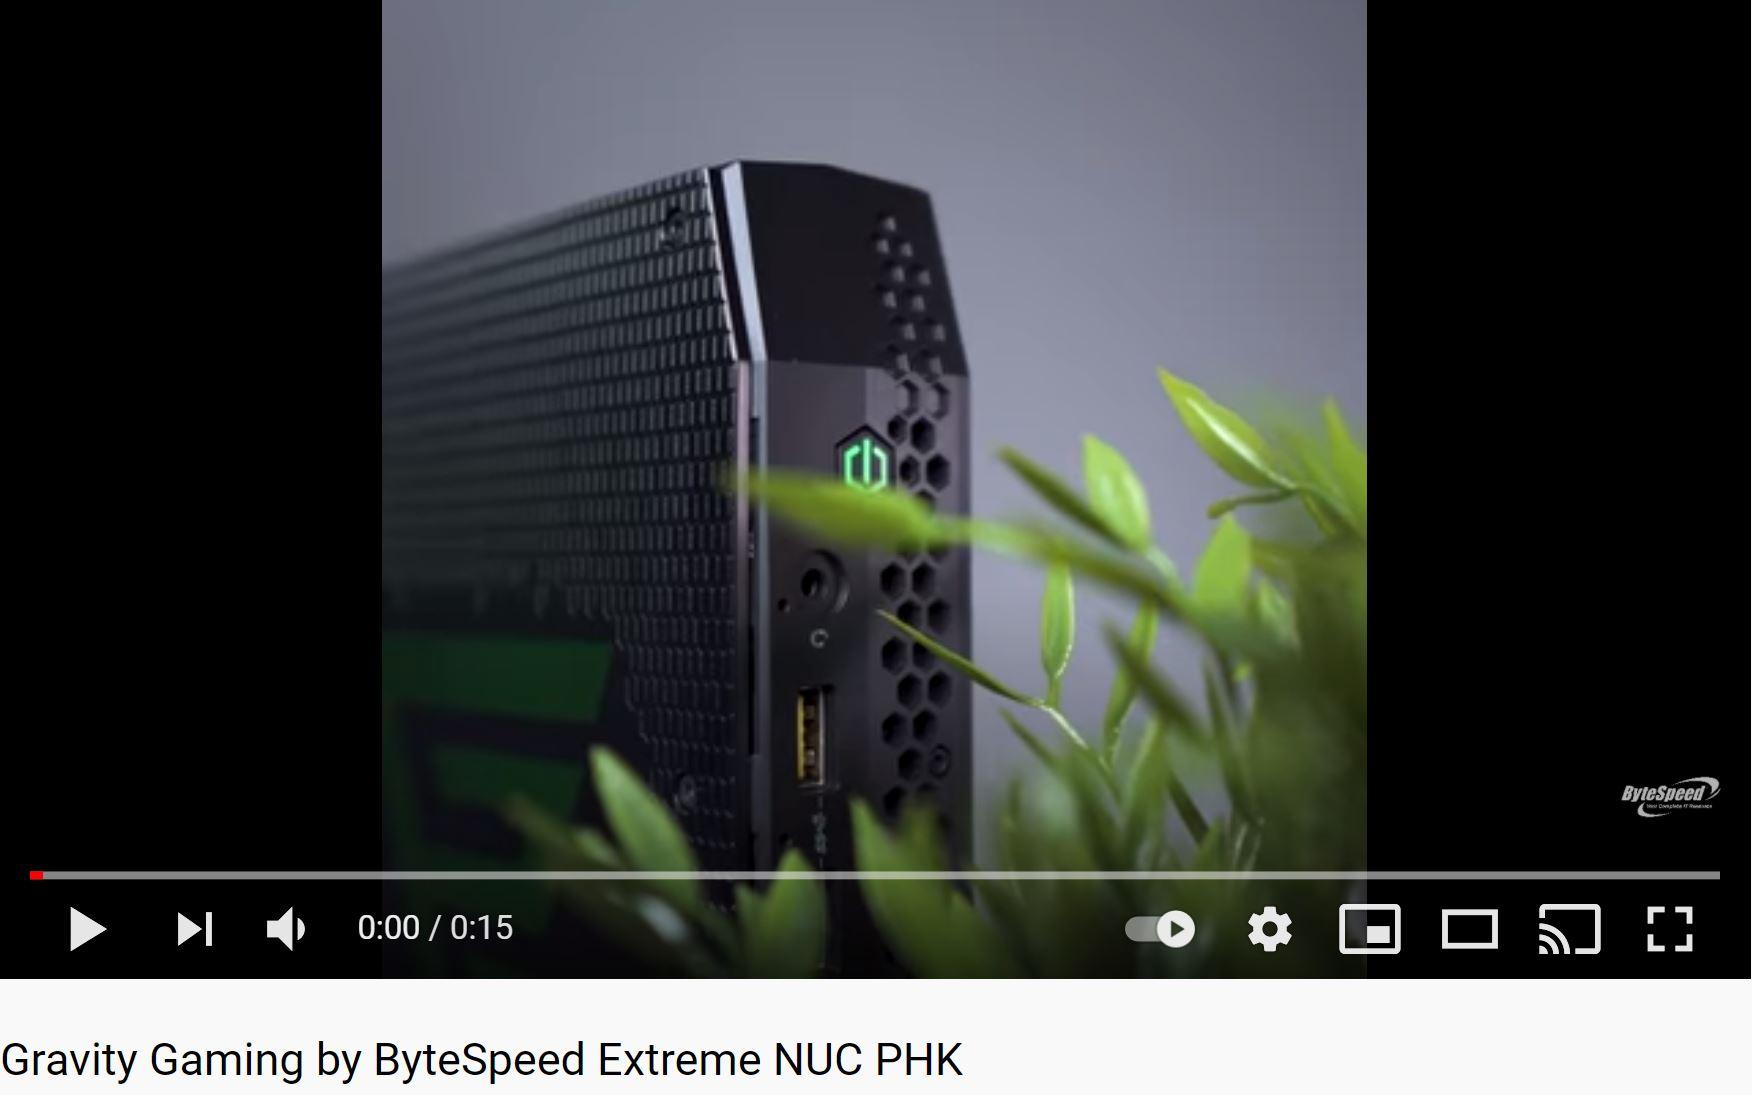 Extreme NUC.JPG - 111.42 Kb